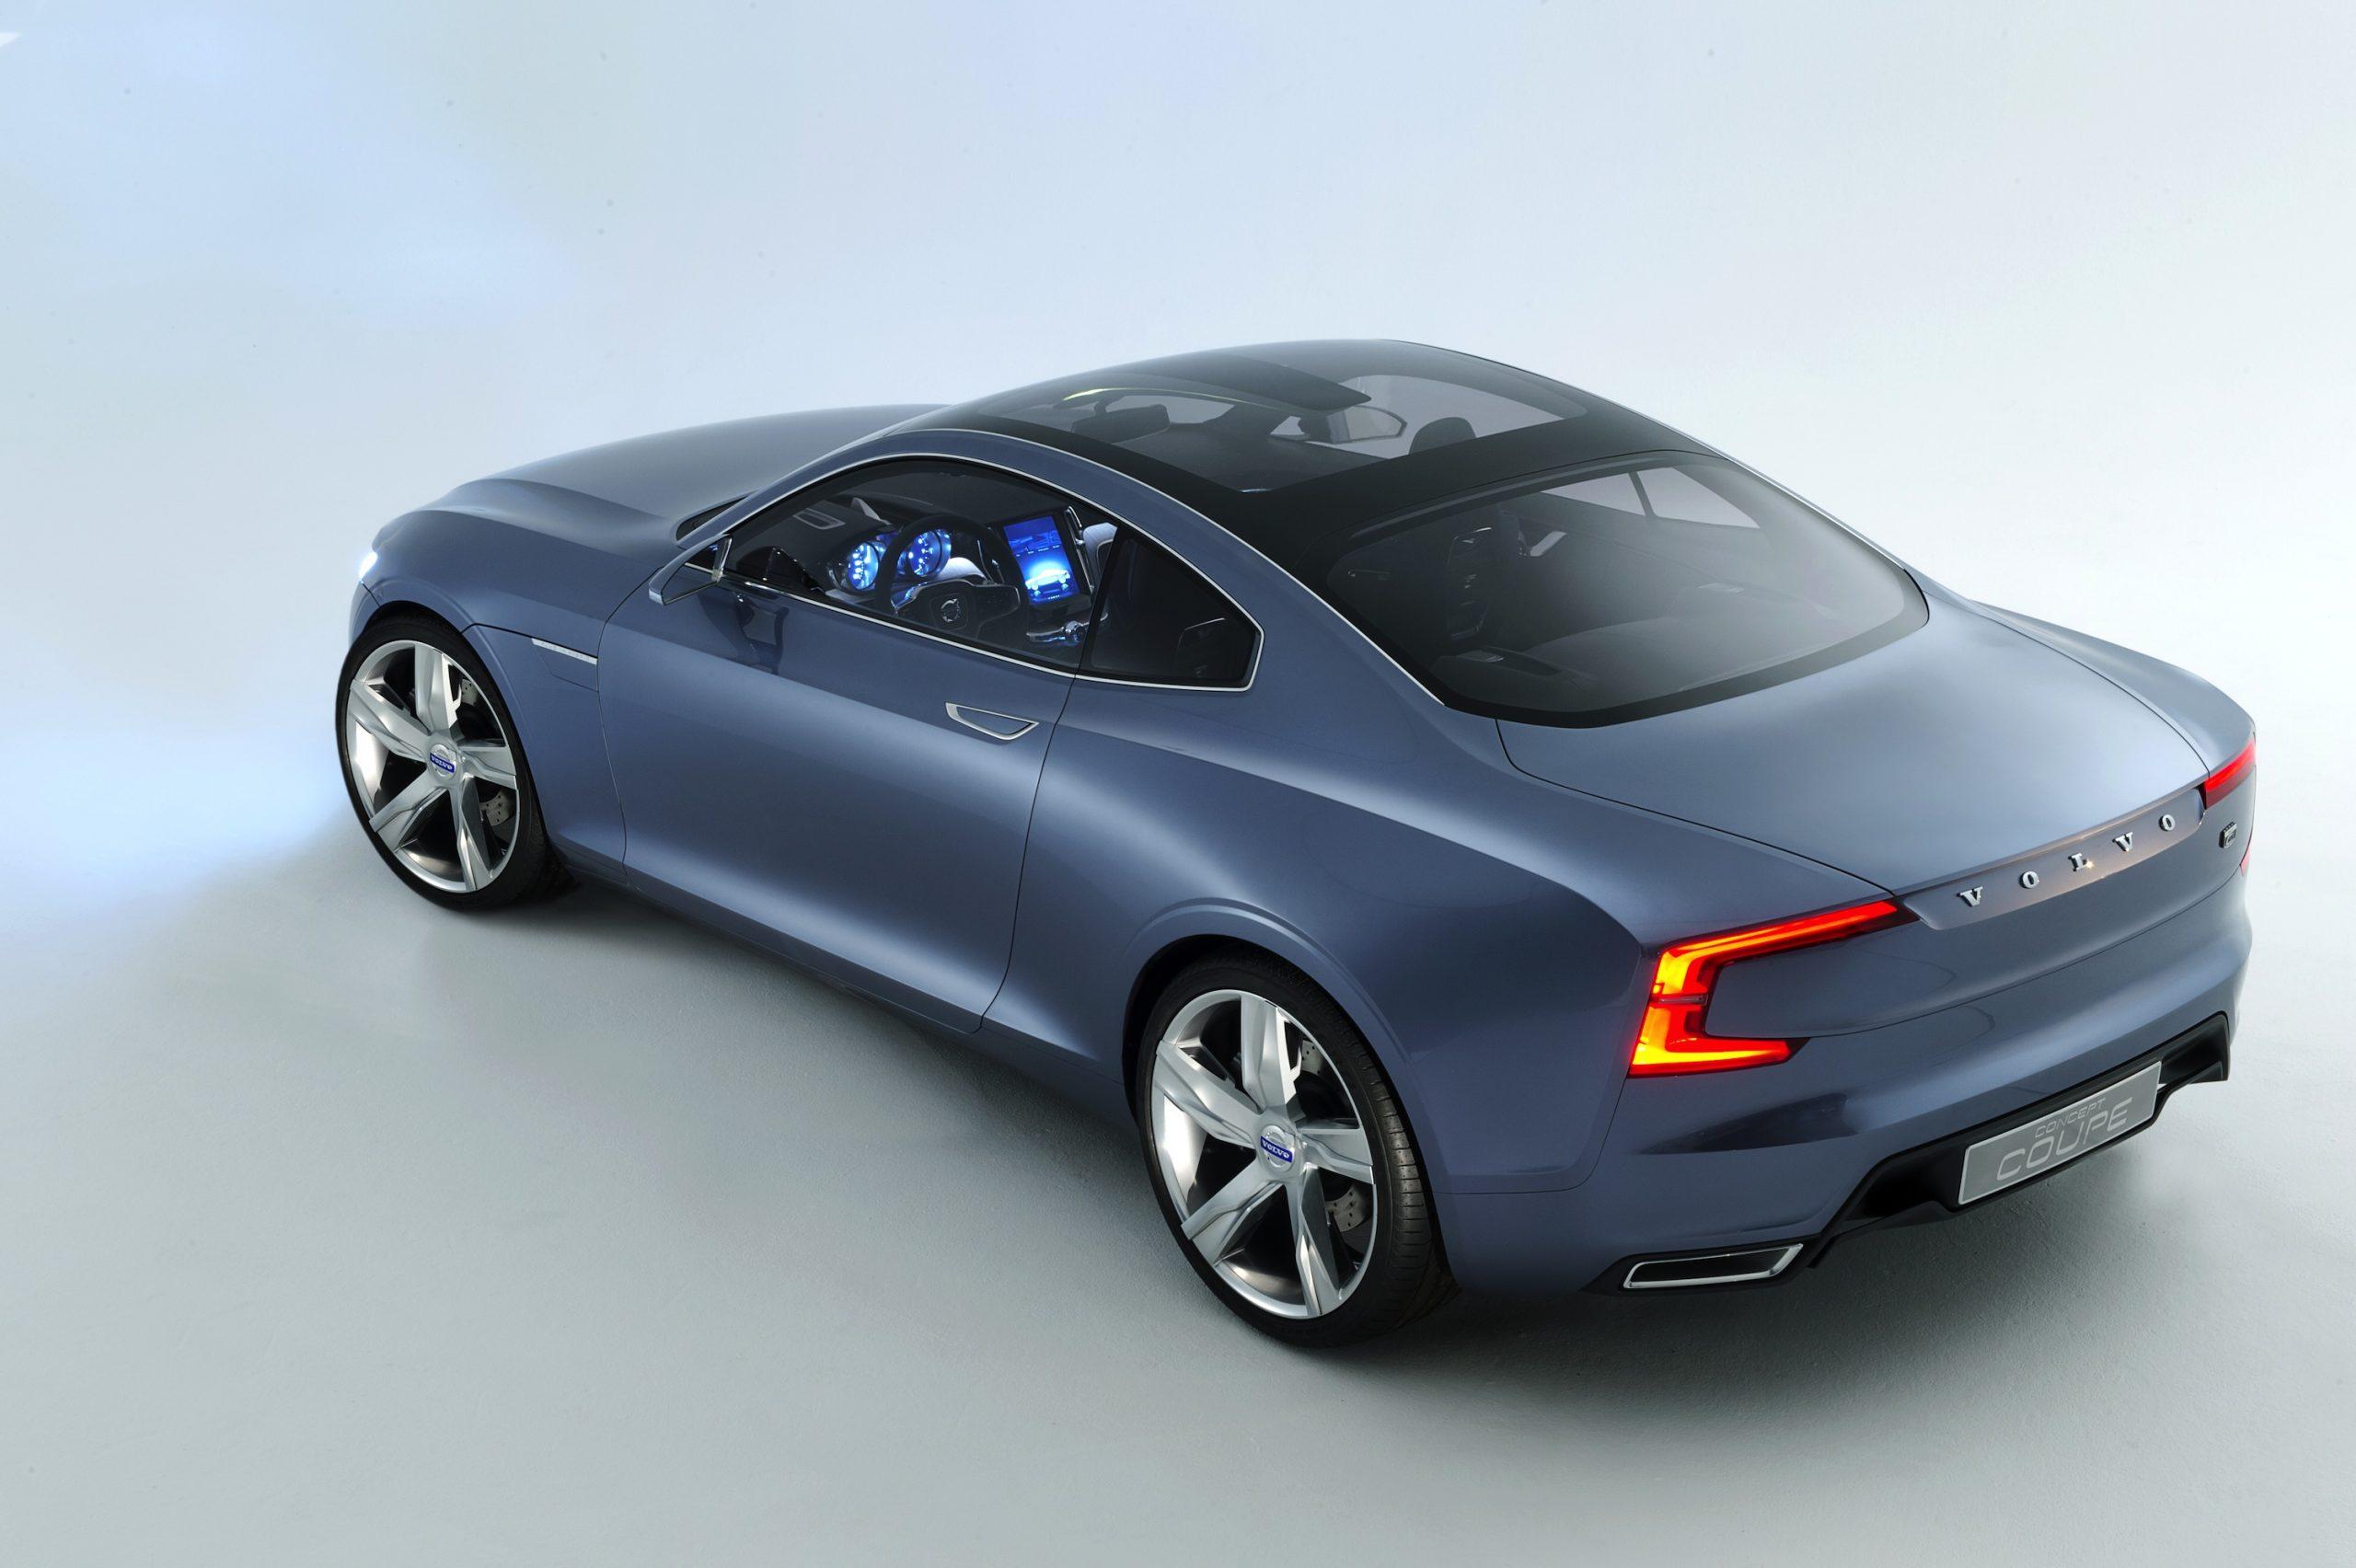 Volvo's Scandinavian Design-Inspired Concept Coupe